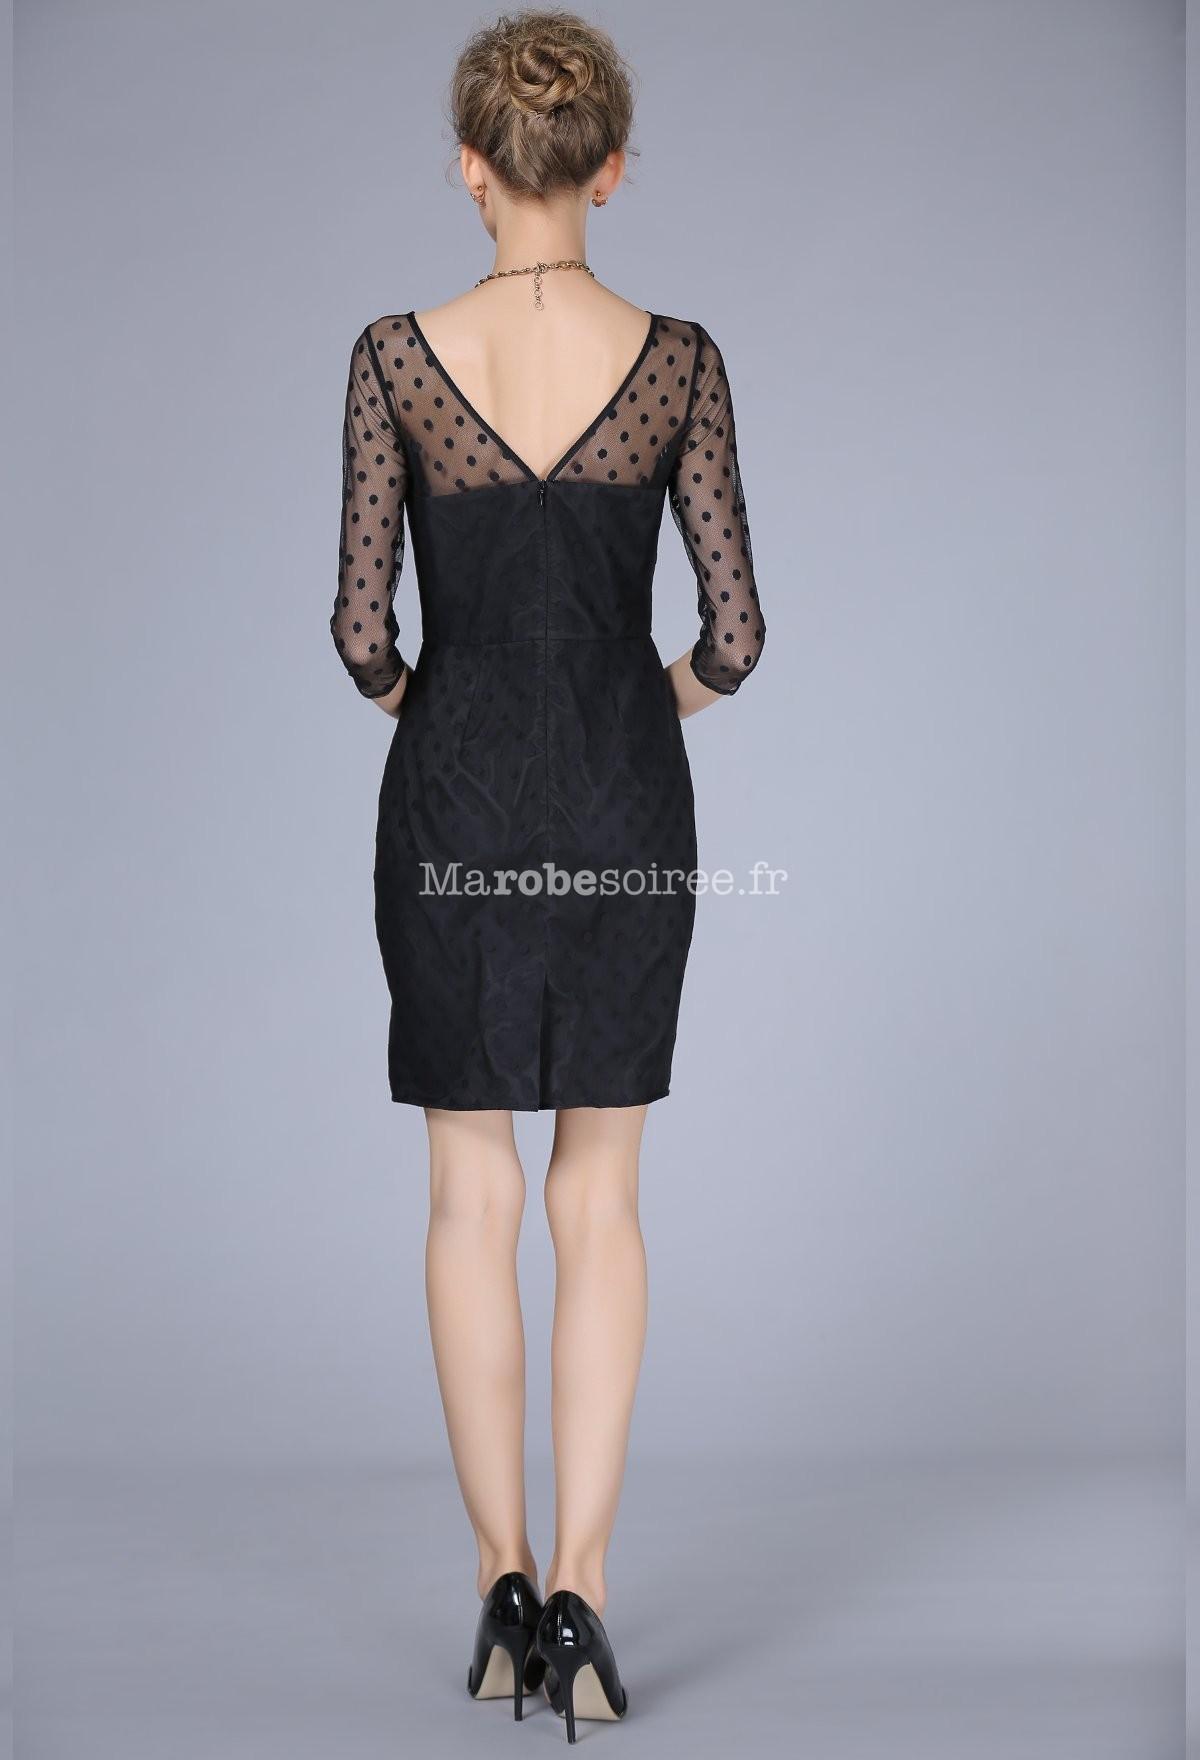 robe cocktail noire bustier poids noirs. Black Bedroom Furniture Sets. Home Design Ideas